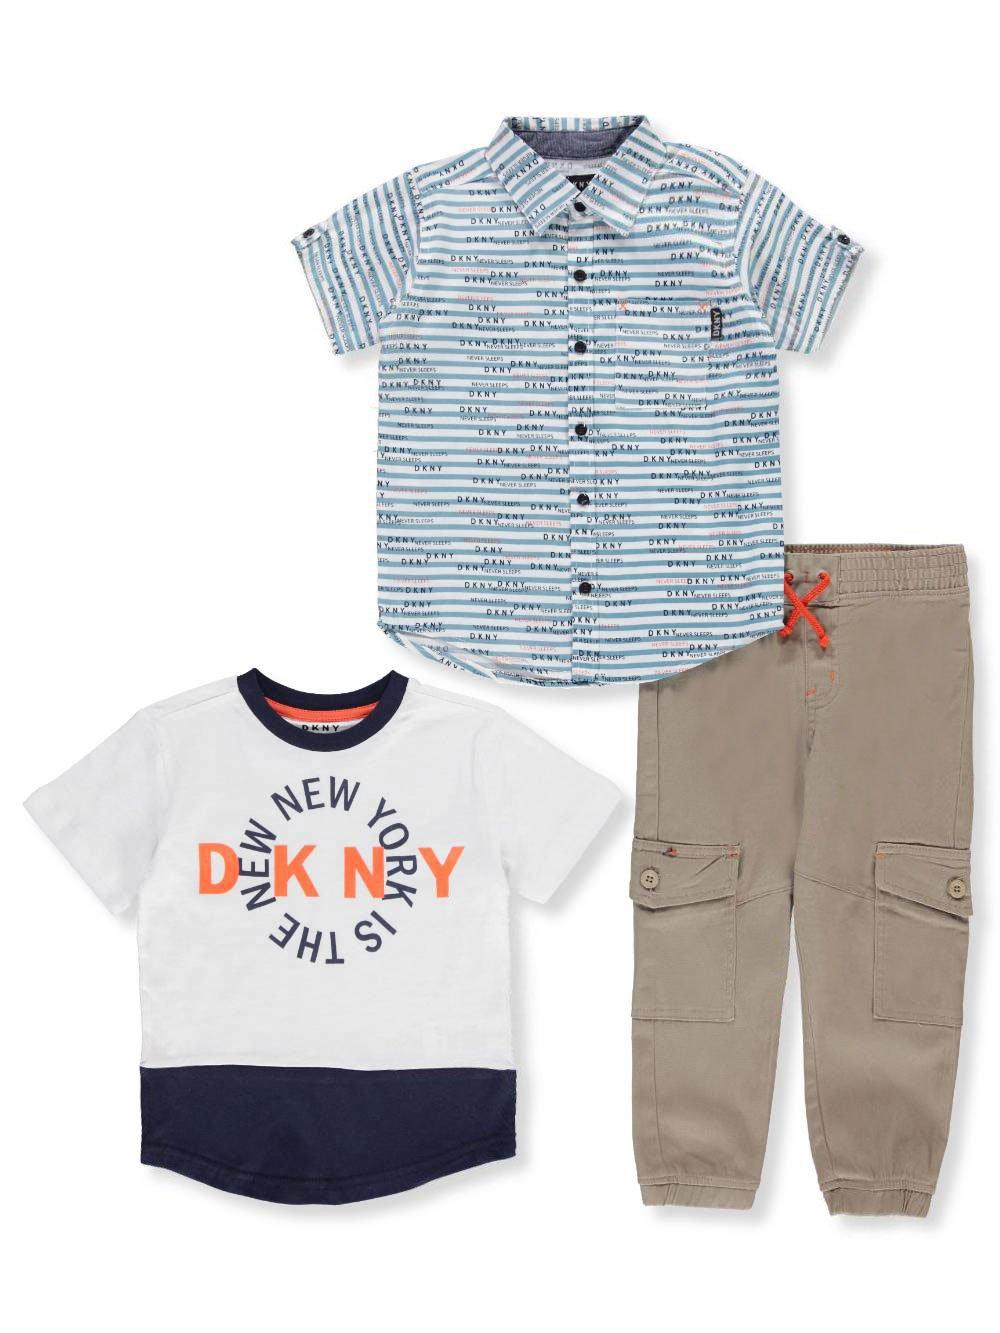 DKNY Little Boys' City Sport Shirt, T-Shirt and Twill Pull-on Cargo Pant, Khaki, 5